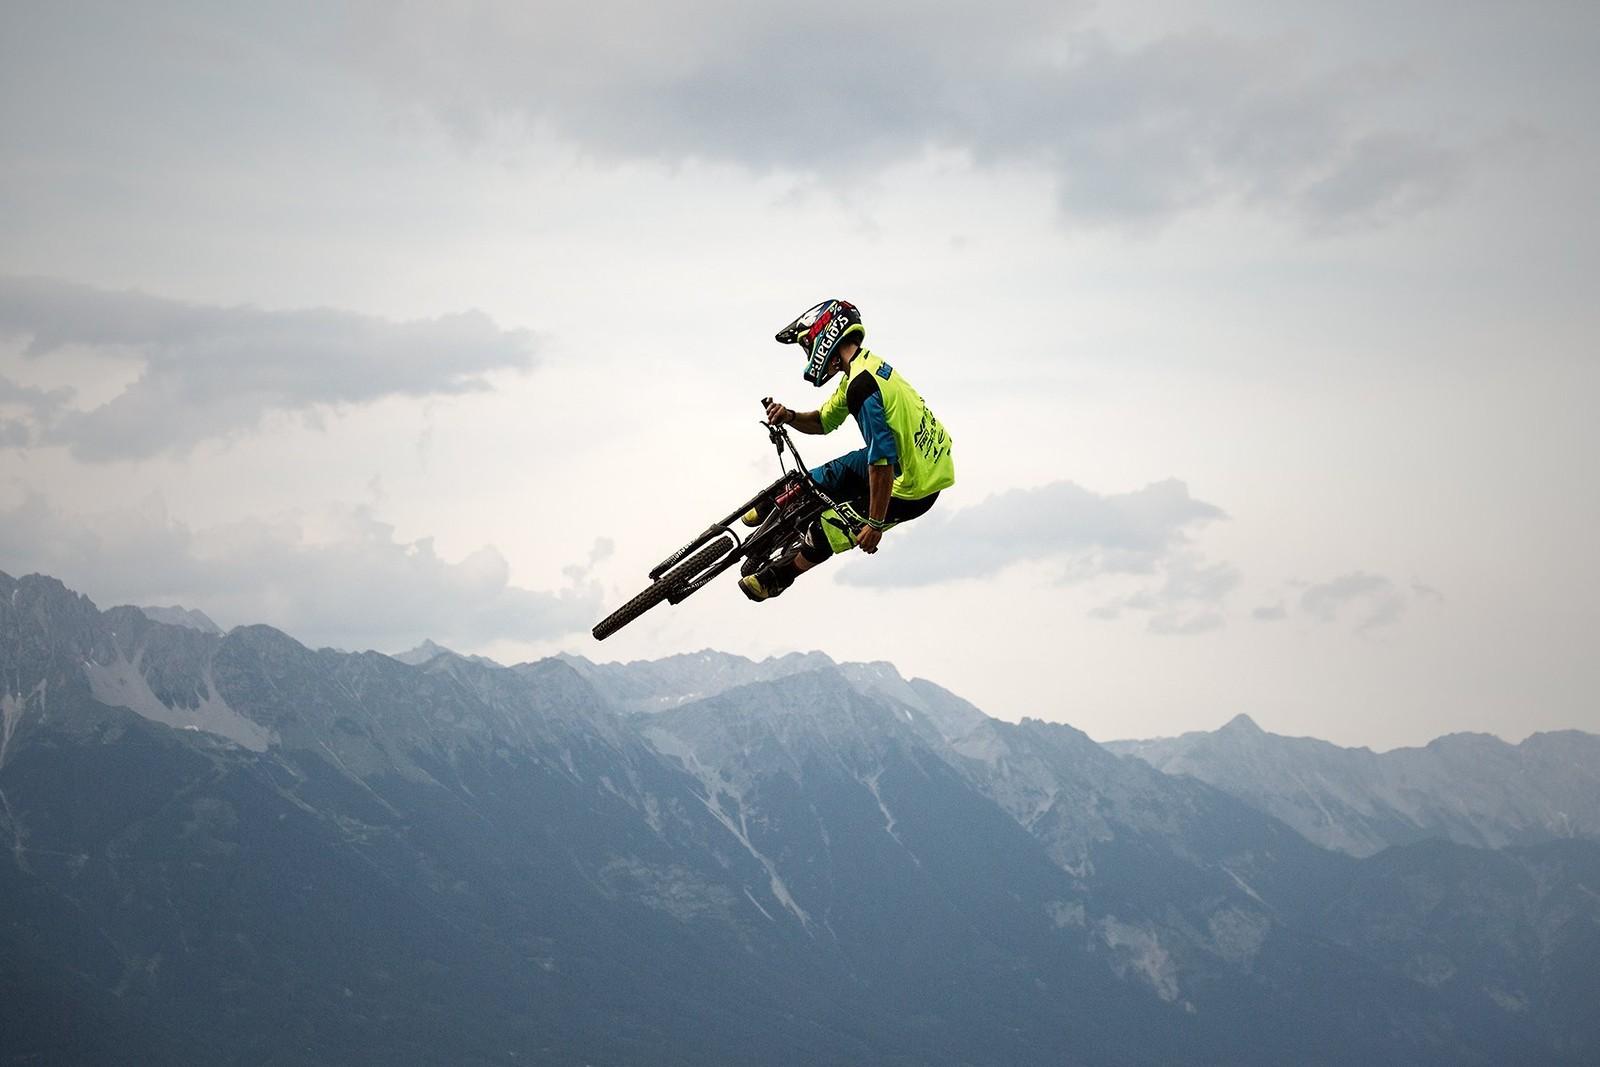 Crankworx Innsbruck_2 - Bluegrass Eagle - Mountain Biking Pictures - Vital MTB